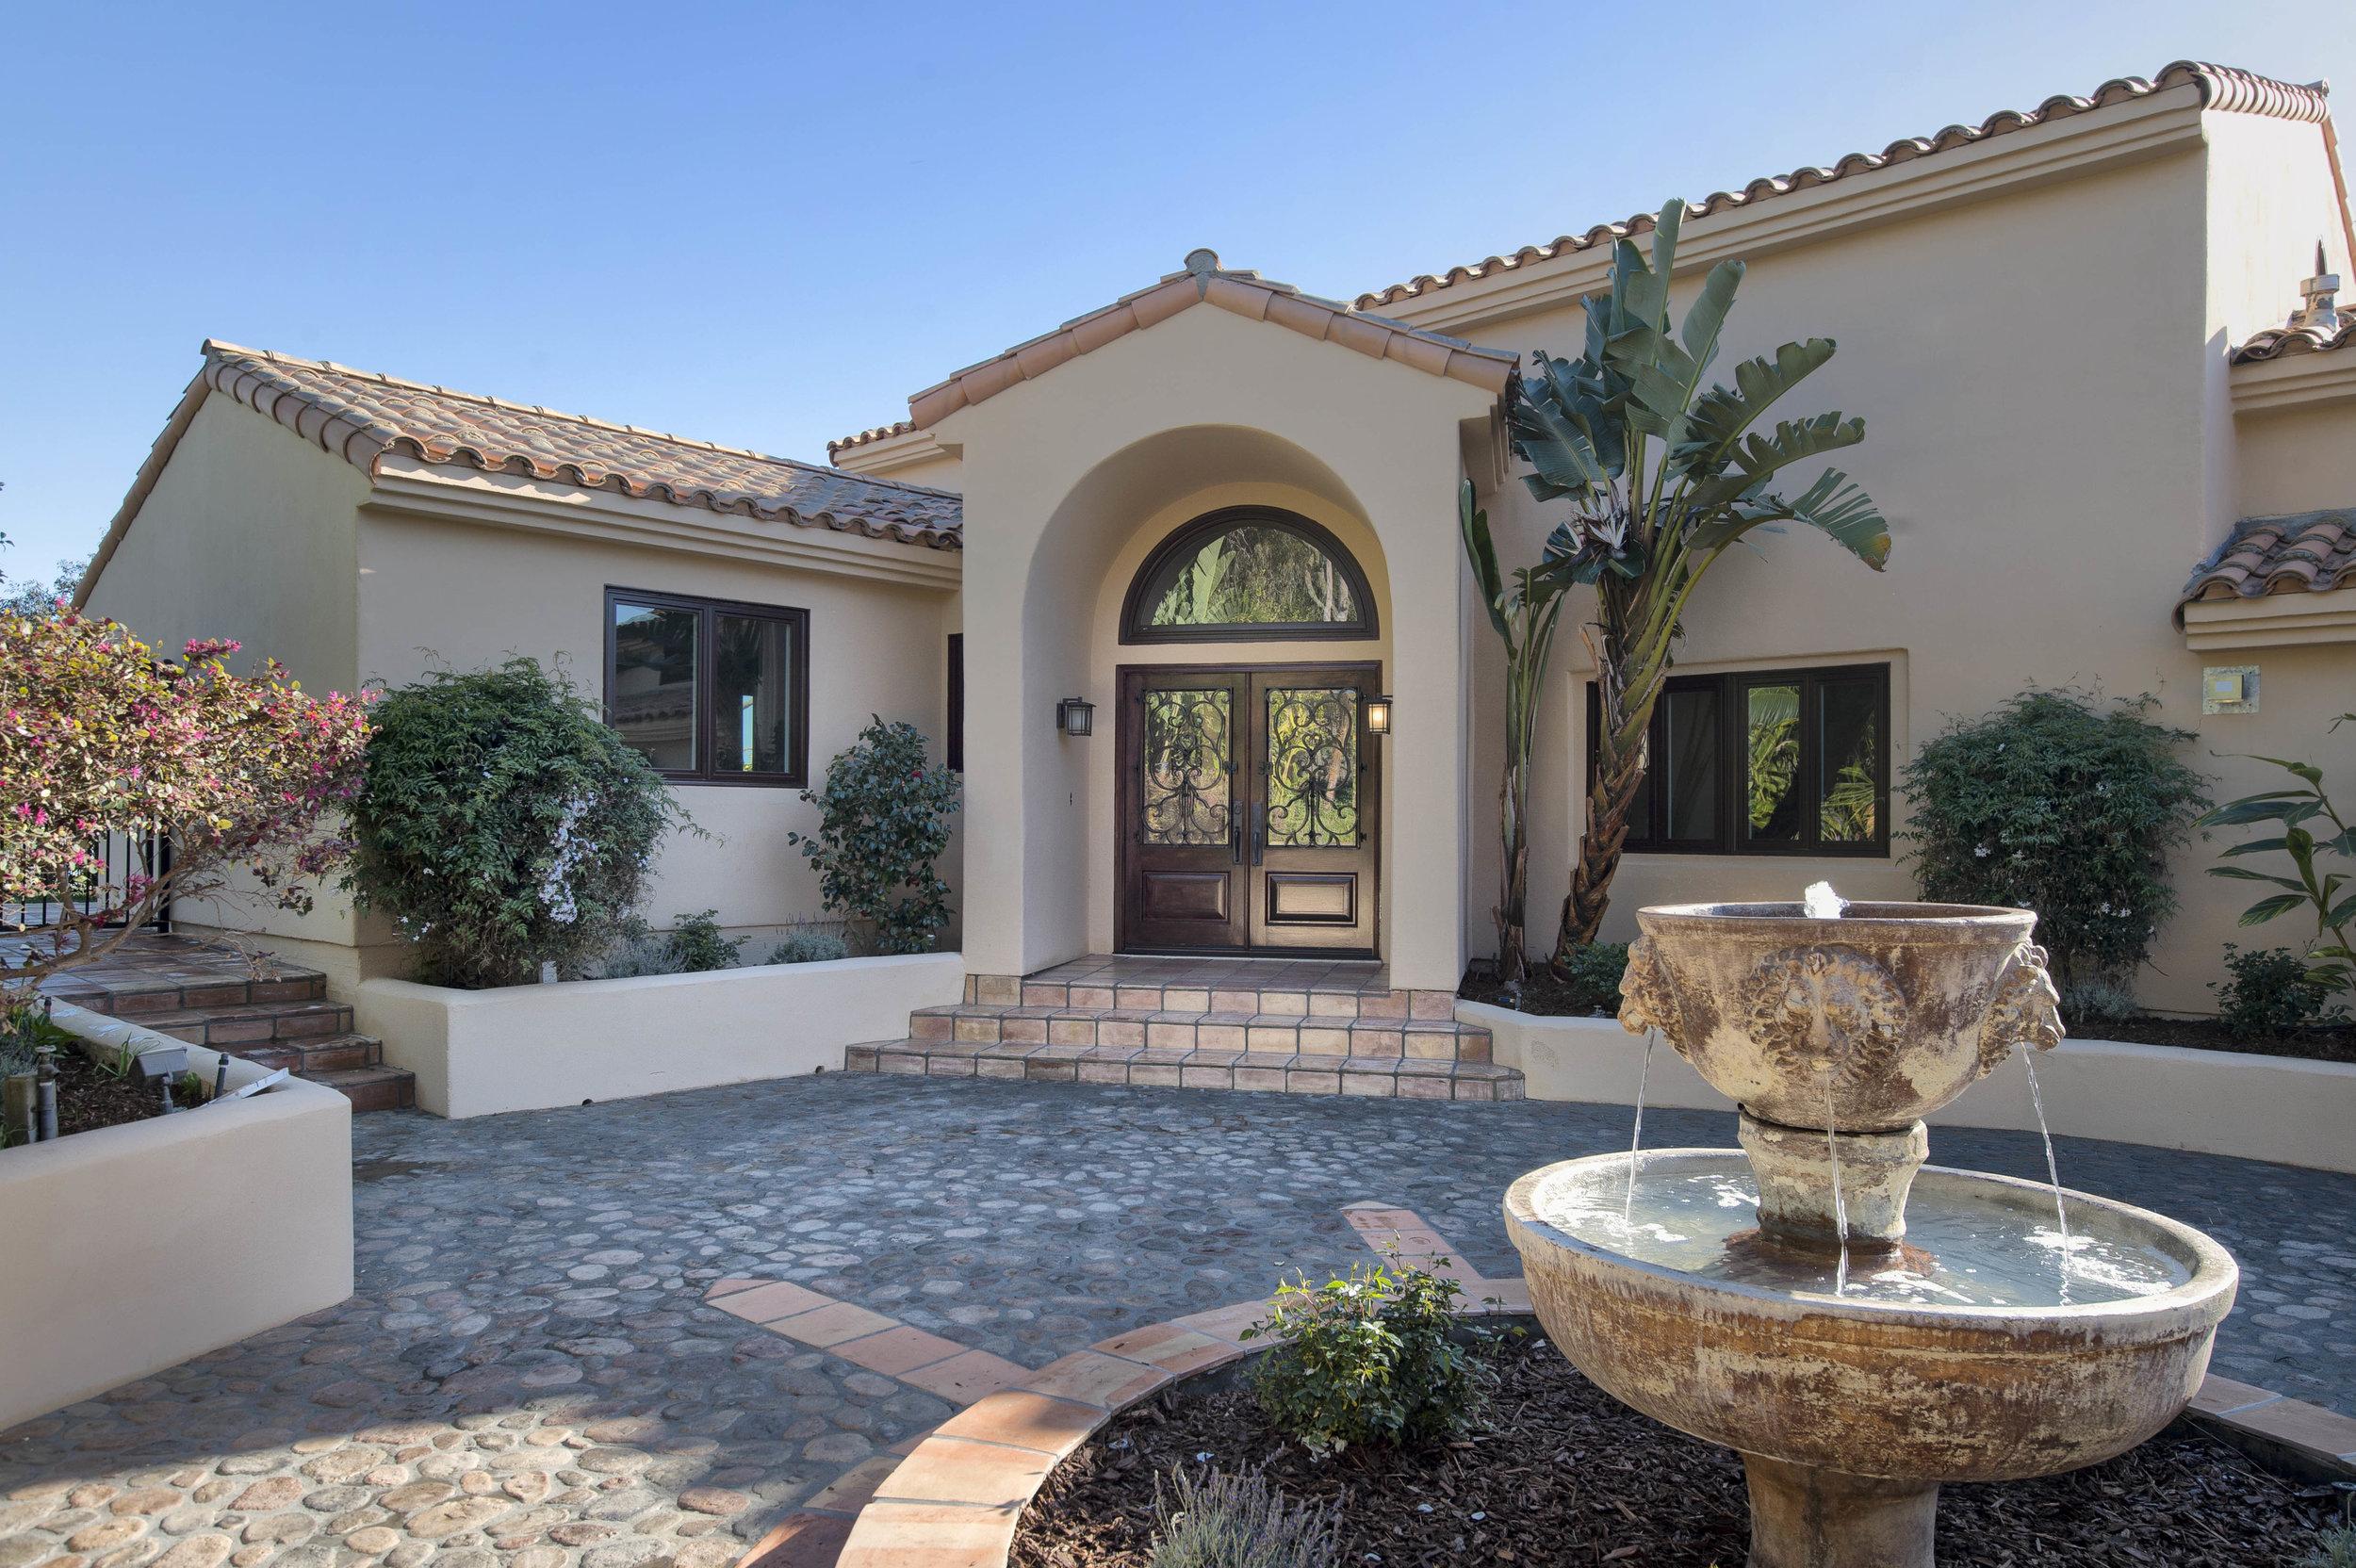 004 6130 Via Cabrillo For Sale Lease The Malibu Life Team Luxury Real Estate.jpg